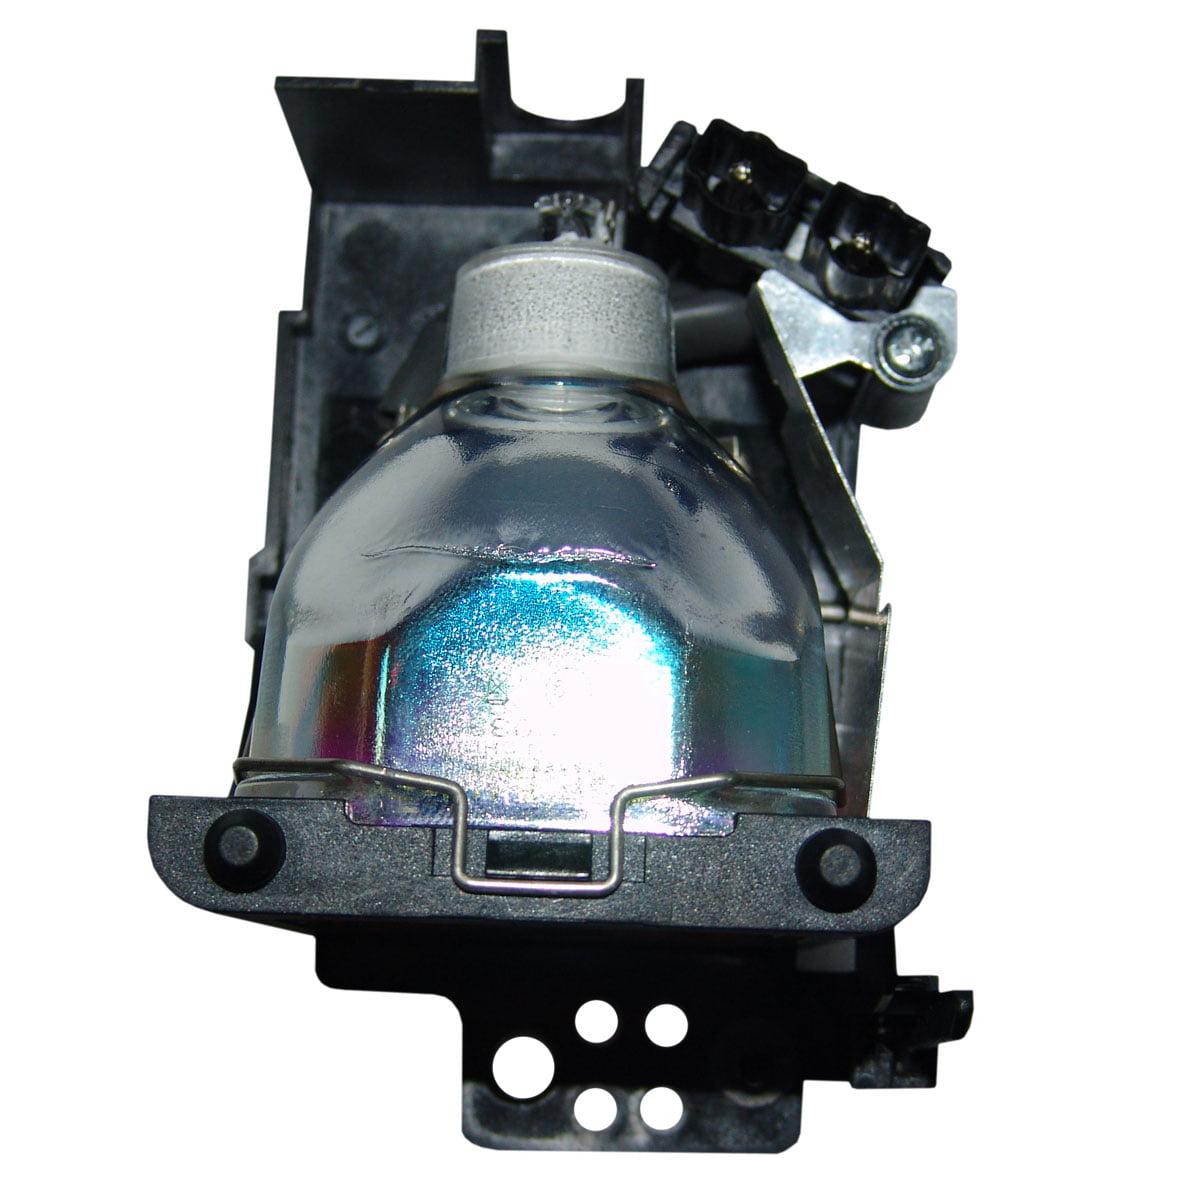 Lutema Platinum for Liesegang DV-345 Projector Lamp (Original Philips Bulb) - image 2 de 5